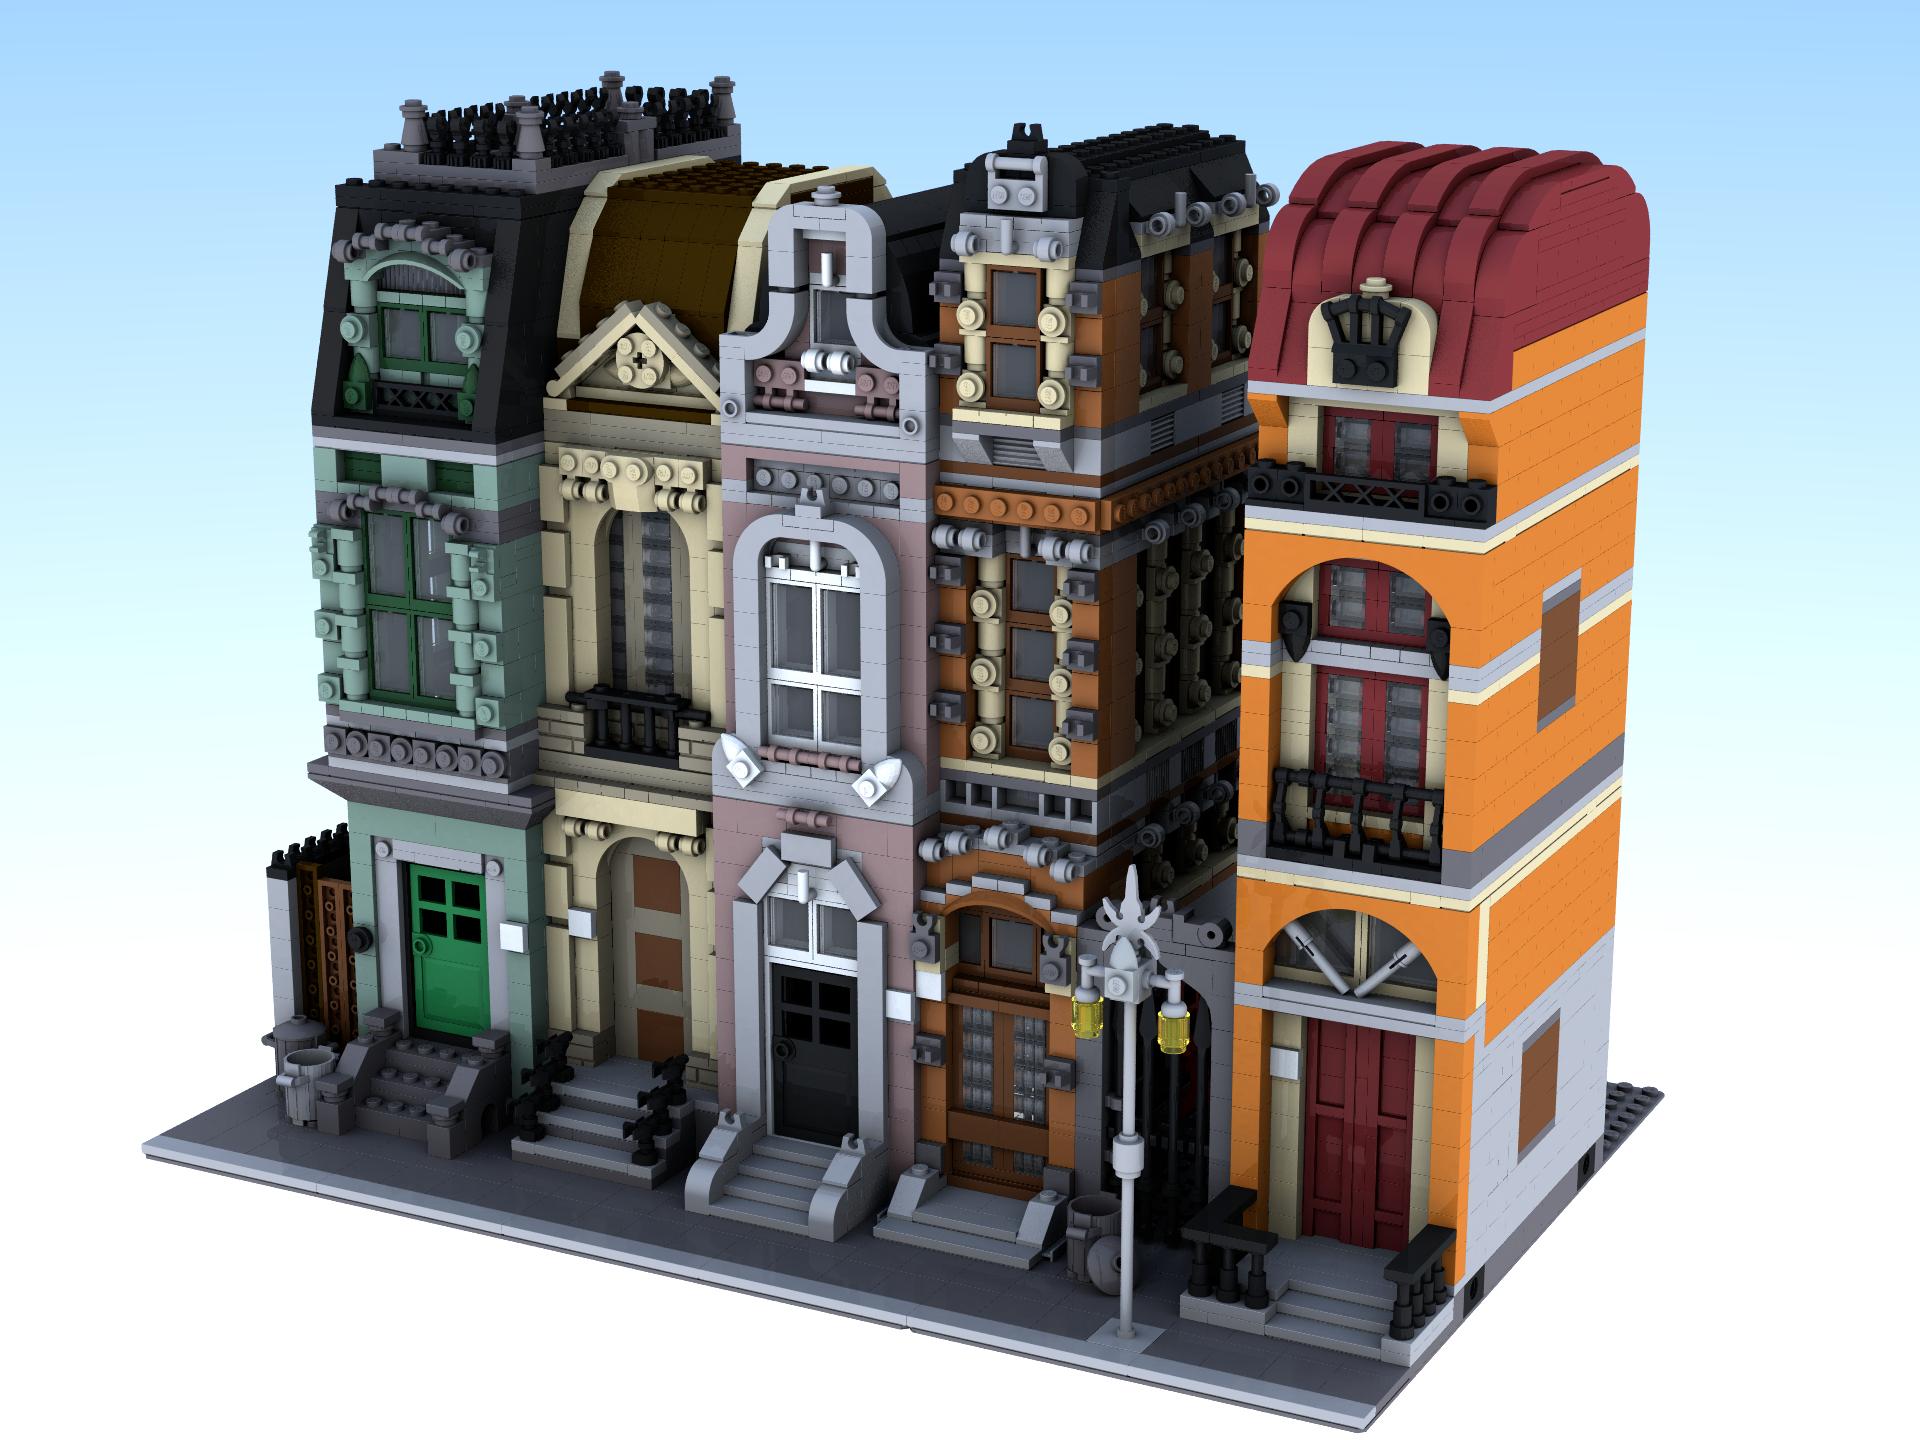 Moc Modular Brickstreet And Orange Building Lego Town